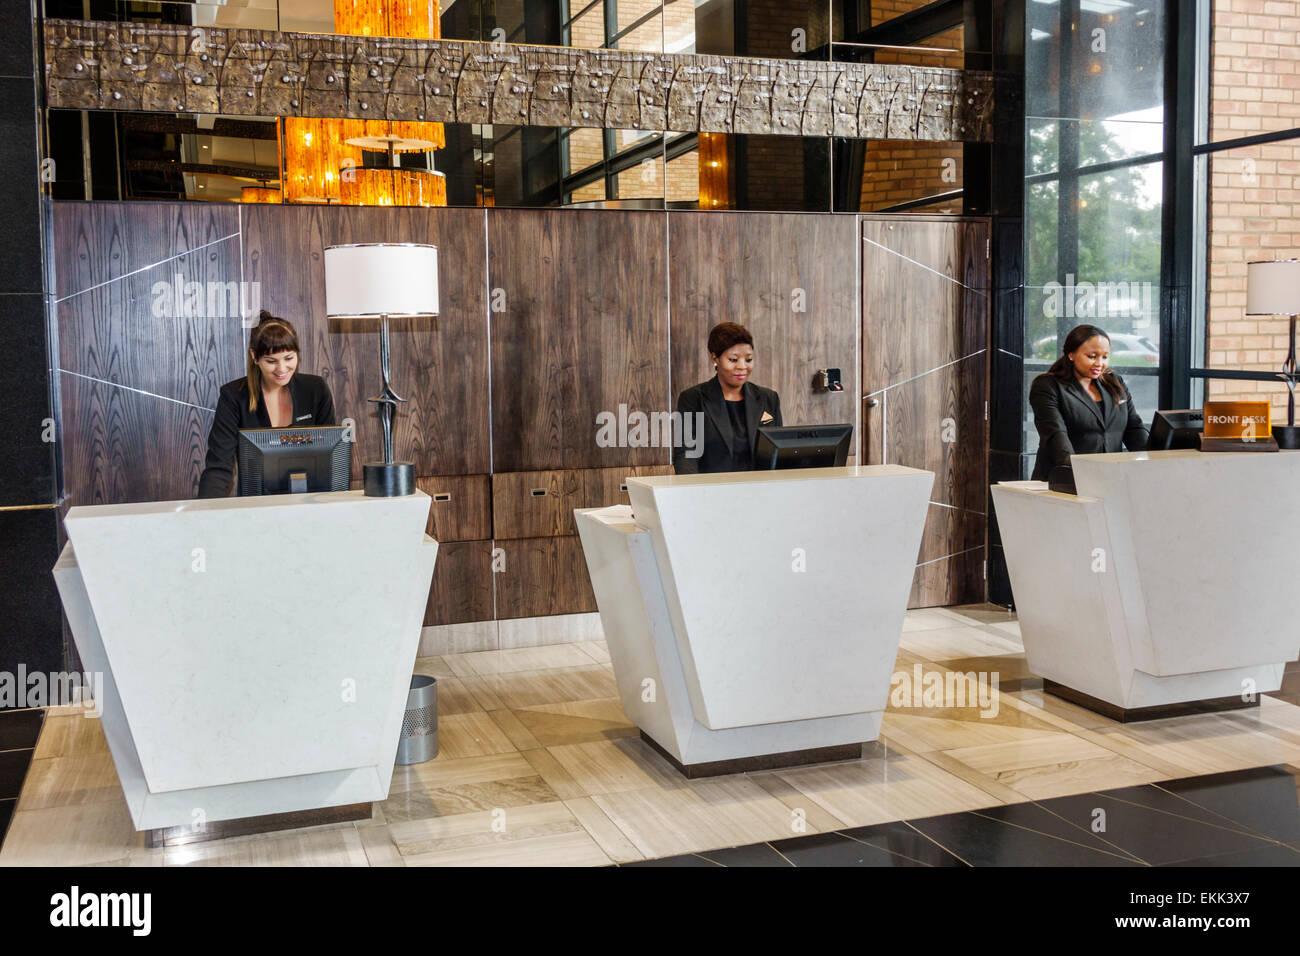 Johannesburg South Africa African Rosebank Hyatt Regency Hotel Lobby Front Desk Reservations Black Woman Employee Job Coworkers Working